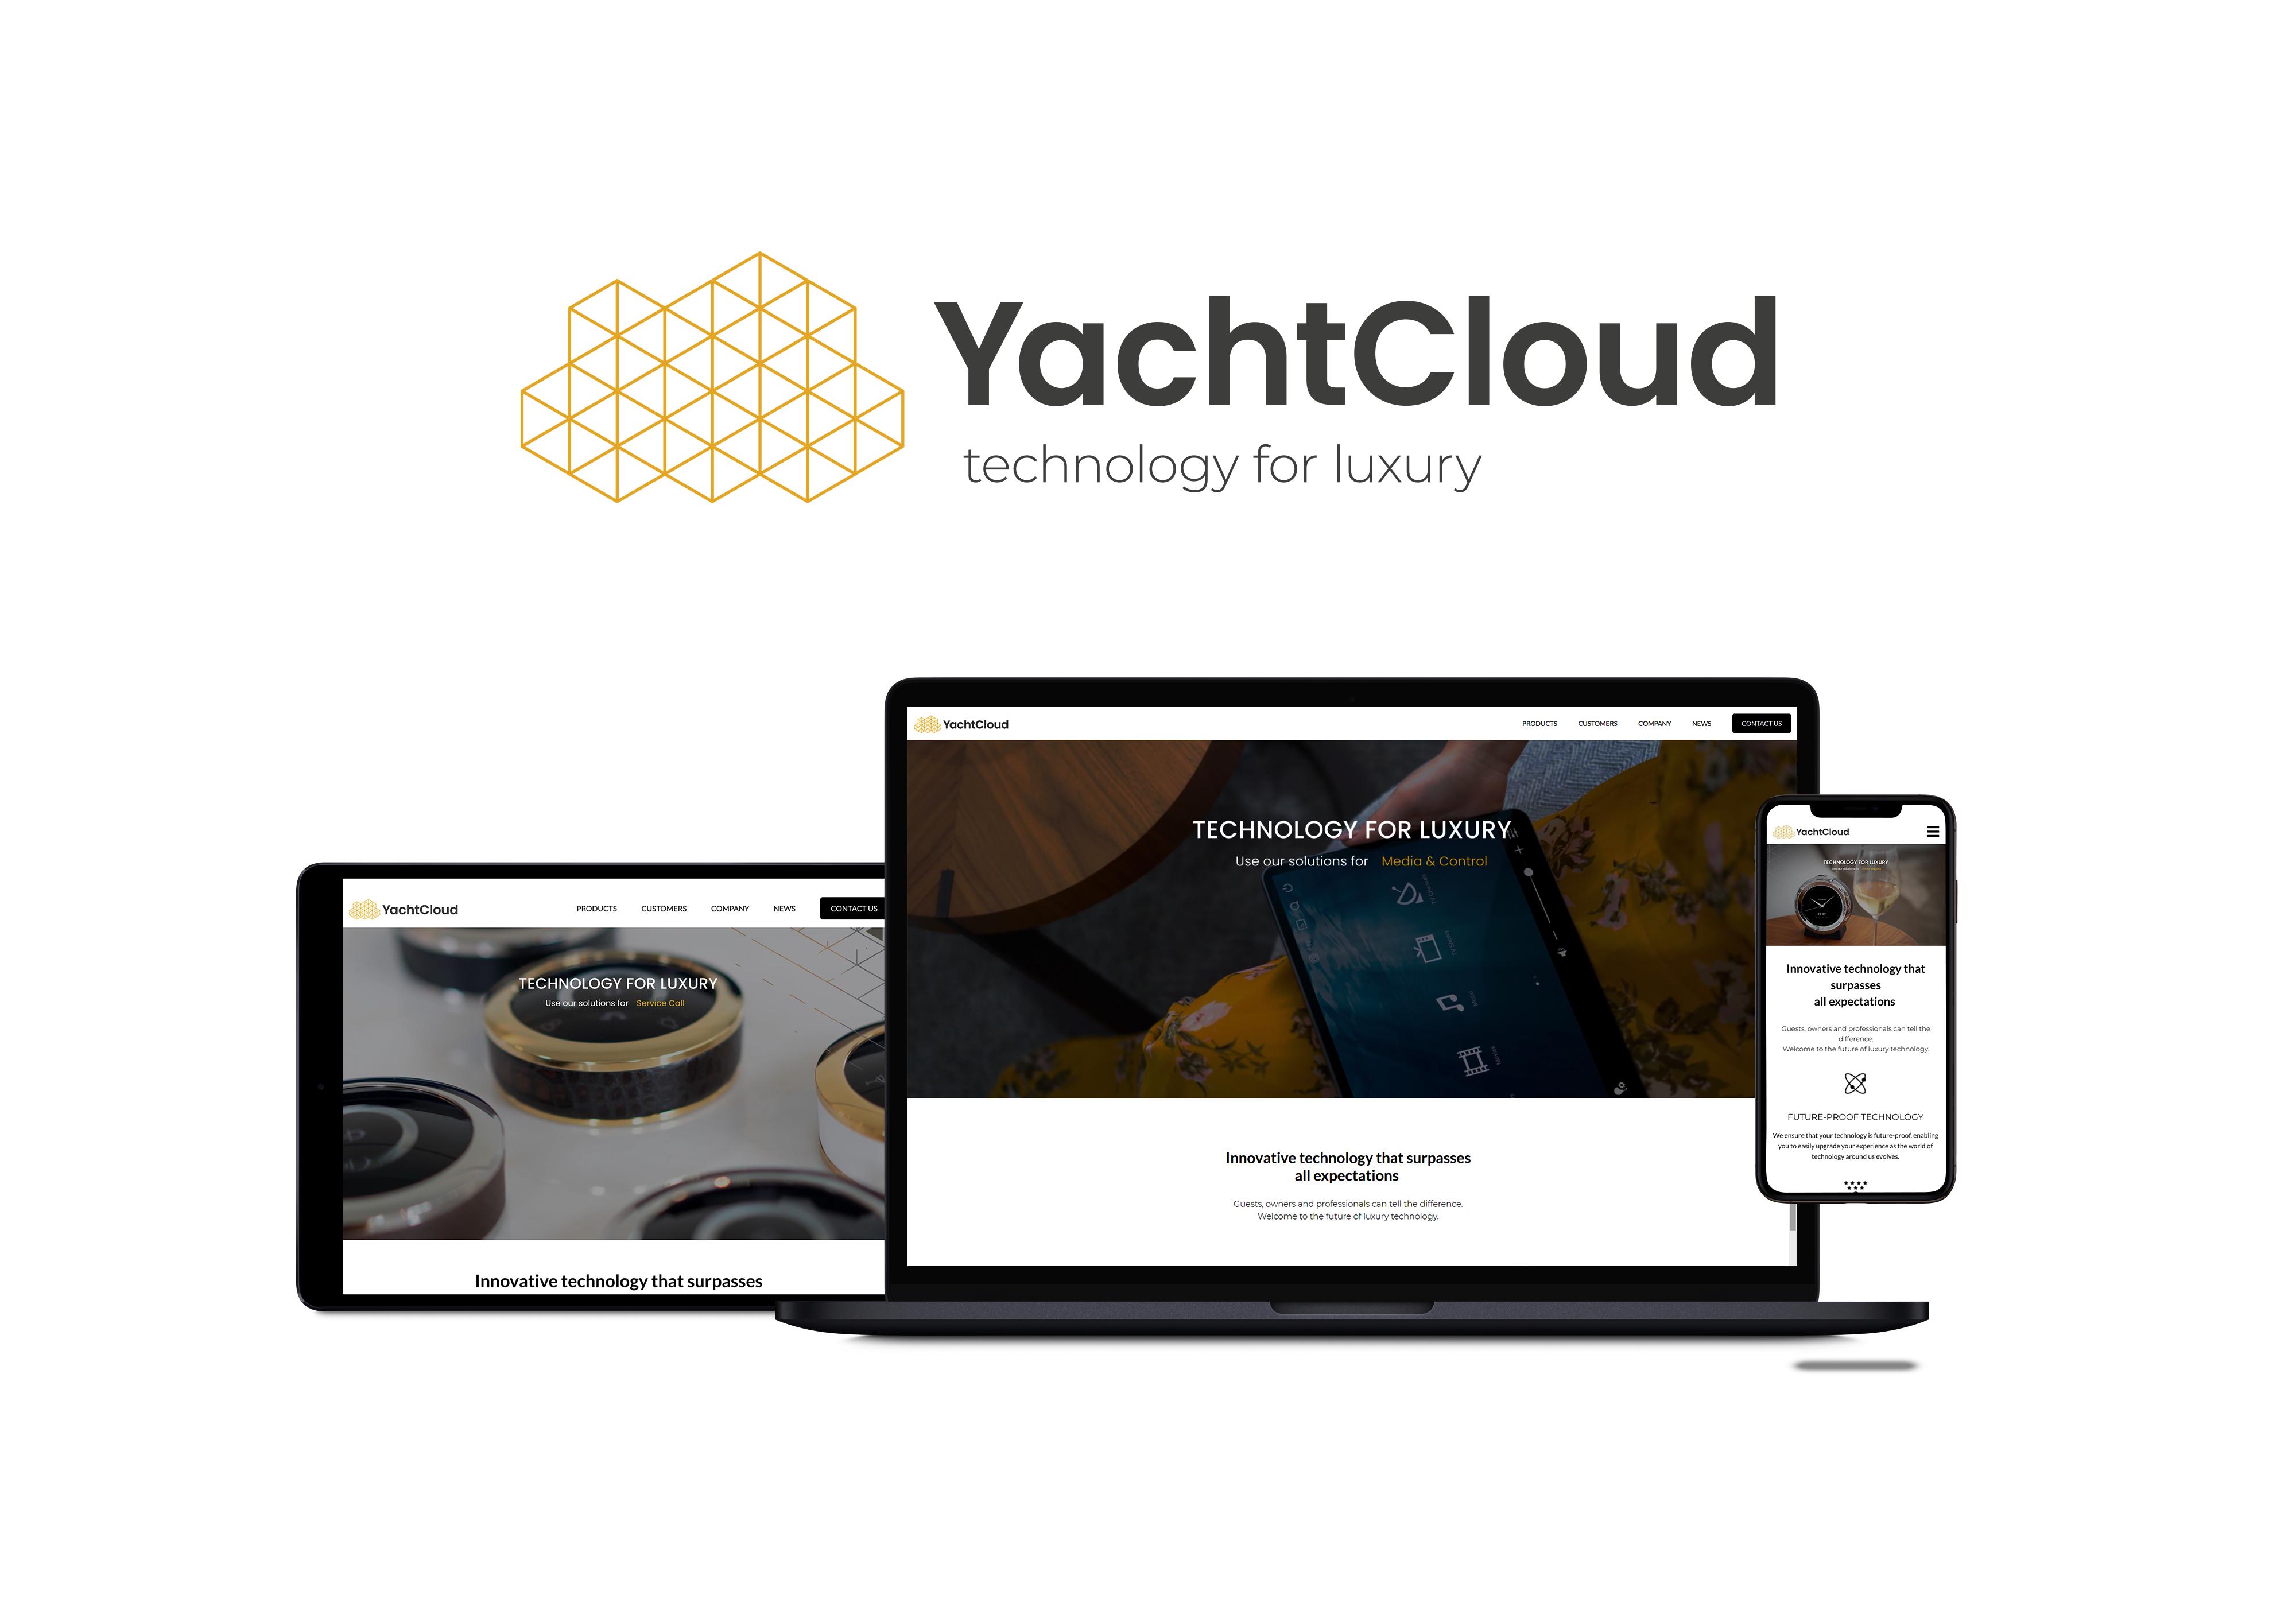 YachtCloud luxury technology brand